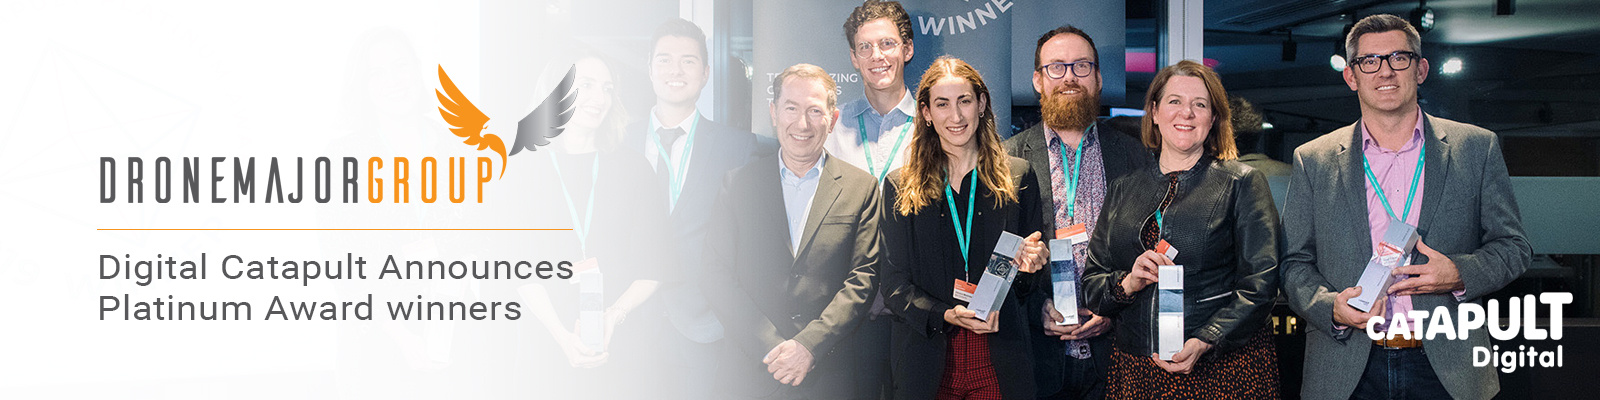 Digital Catapult announces Platinum Award winners